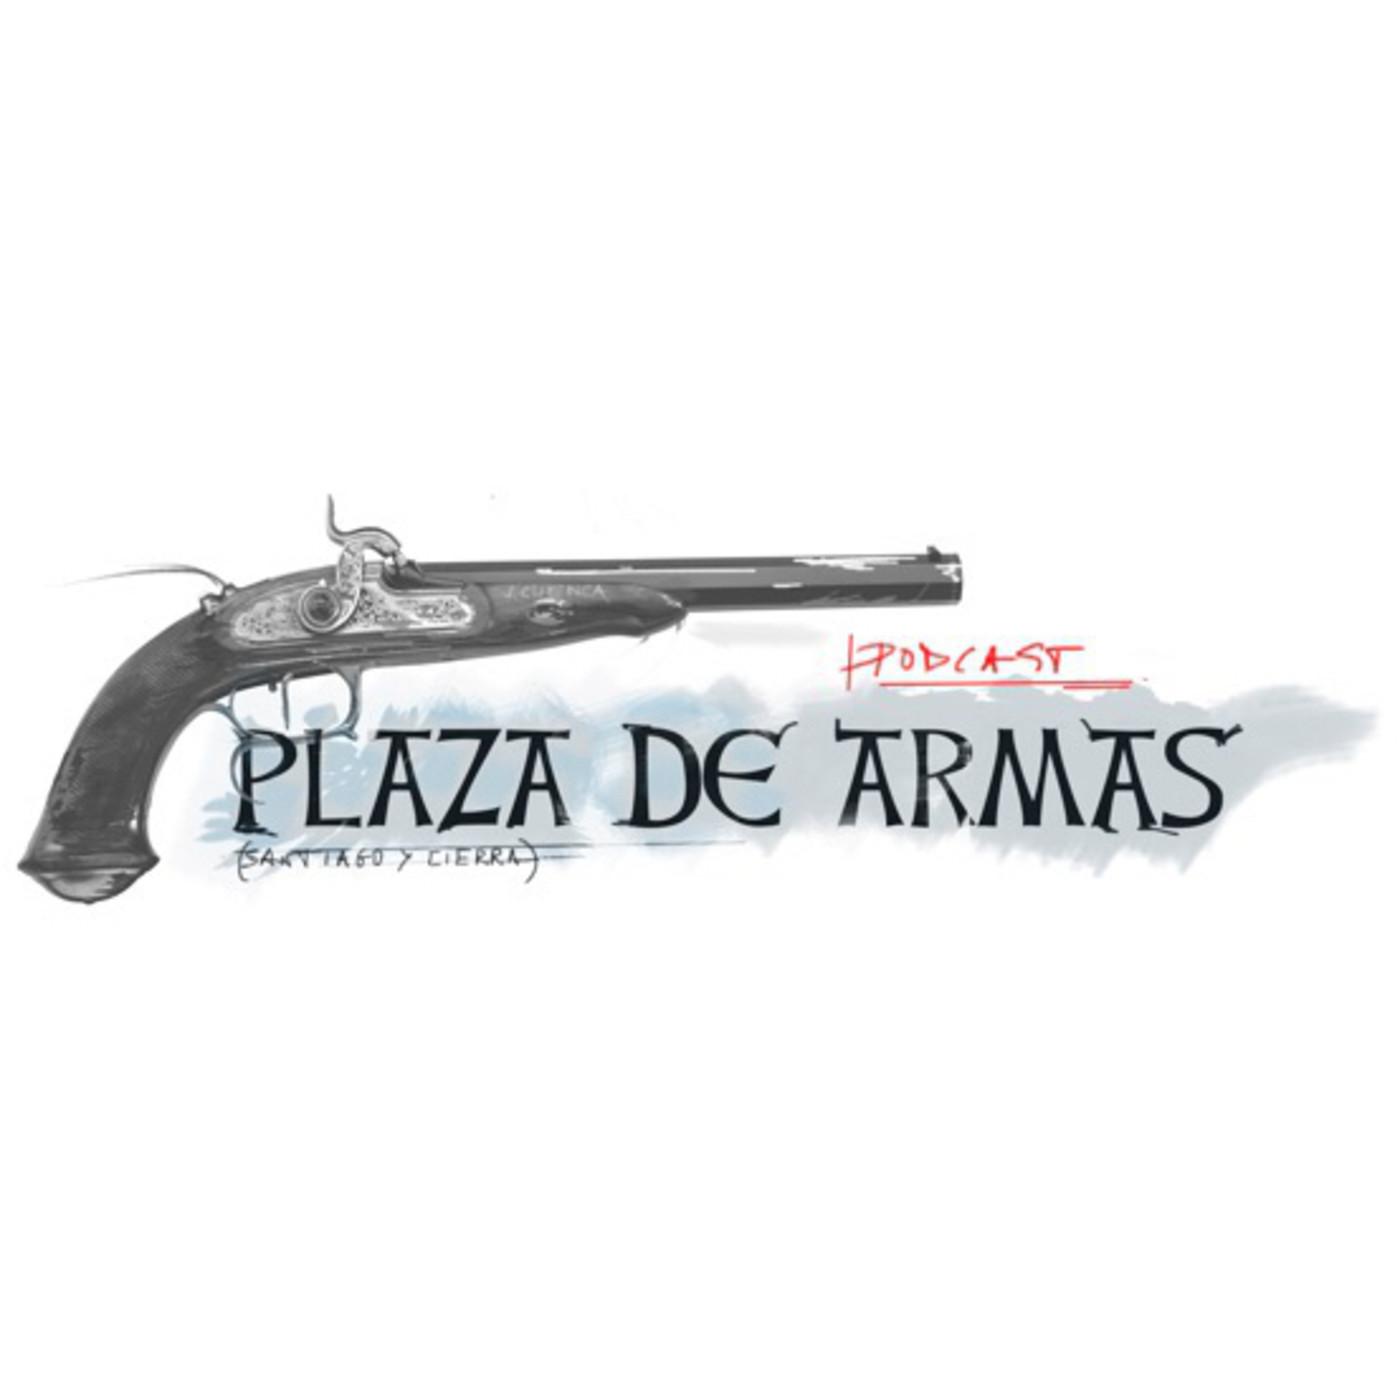 <![CDATA[Plaza de Armas]]>